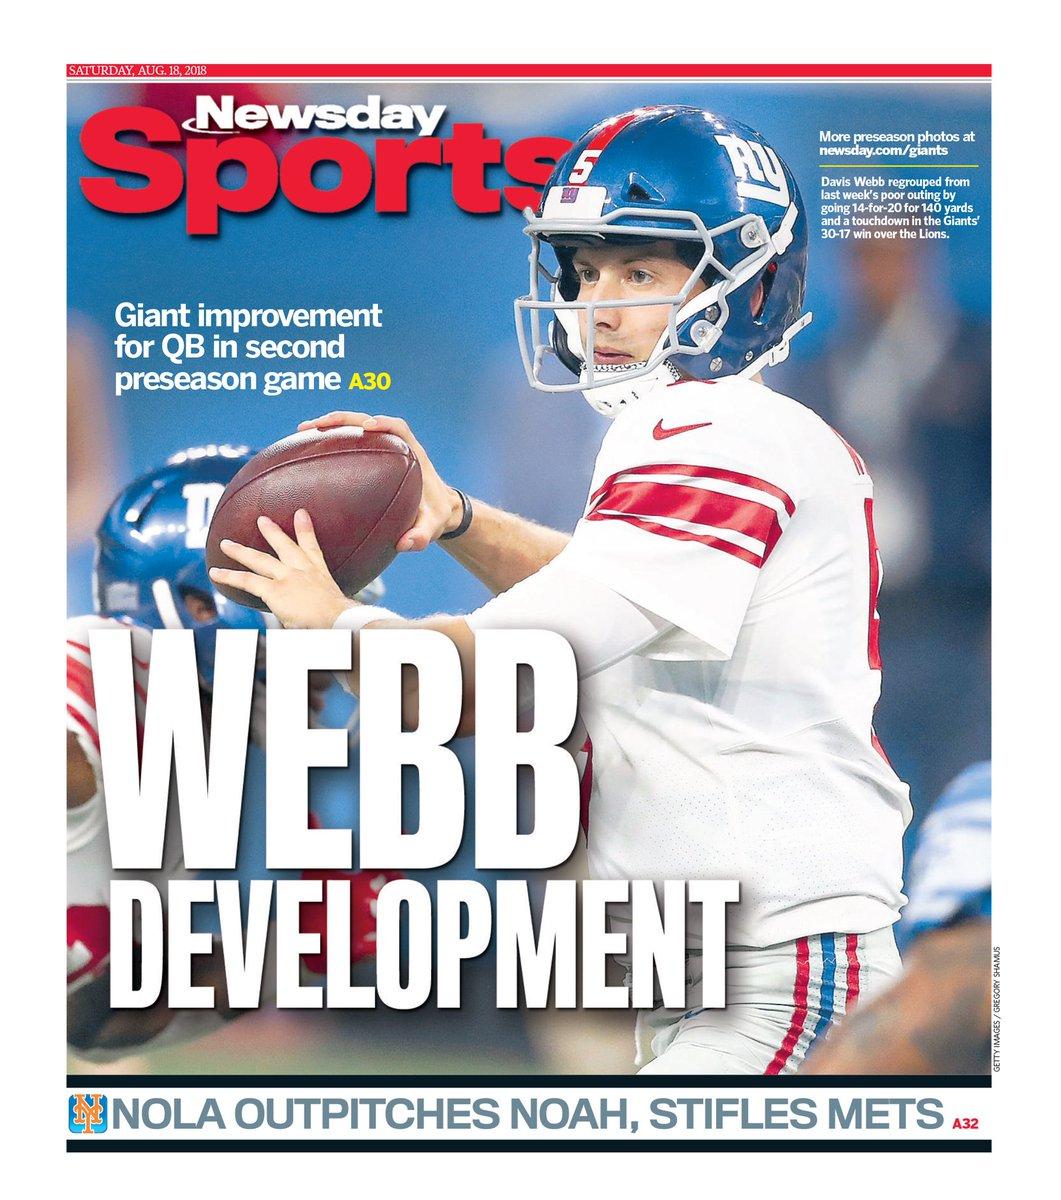 Newsday&#39;s Early Saturday Back Page (Yanks to follow) Davis Webb takes Giant step in second preseason game @NewsdaySports @APSE_sportmedia  @TomRock_Newsday @BobGlauber  #giants #GiantsPride<br>http://pic.twitter.com/K213MkU31h